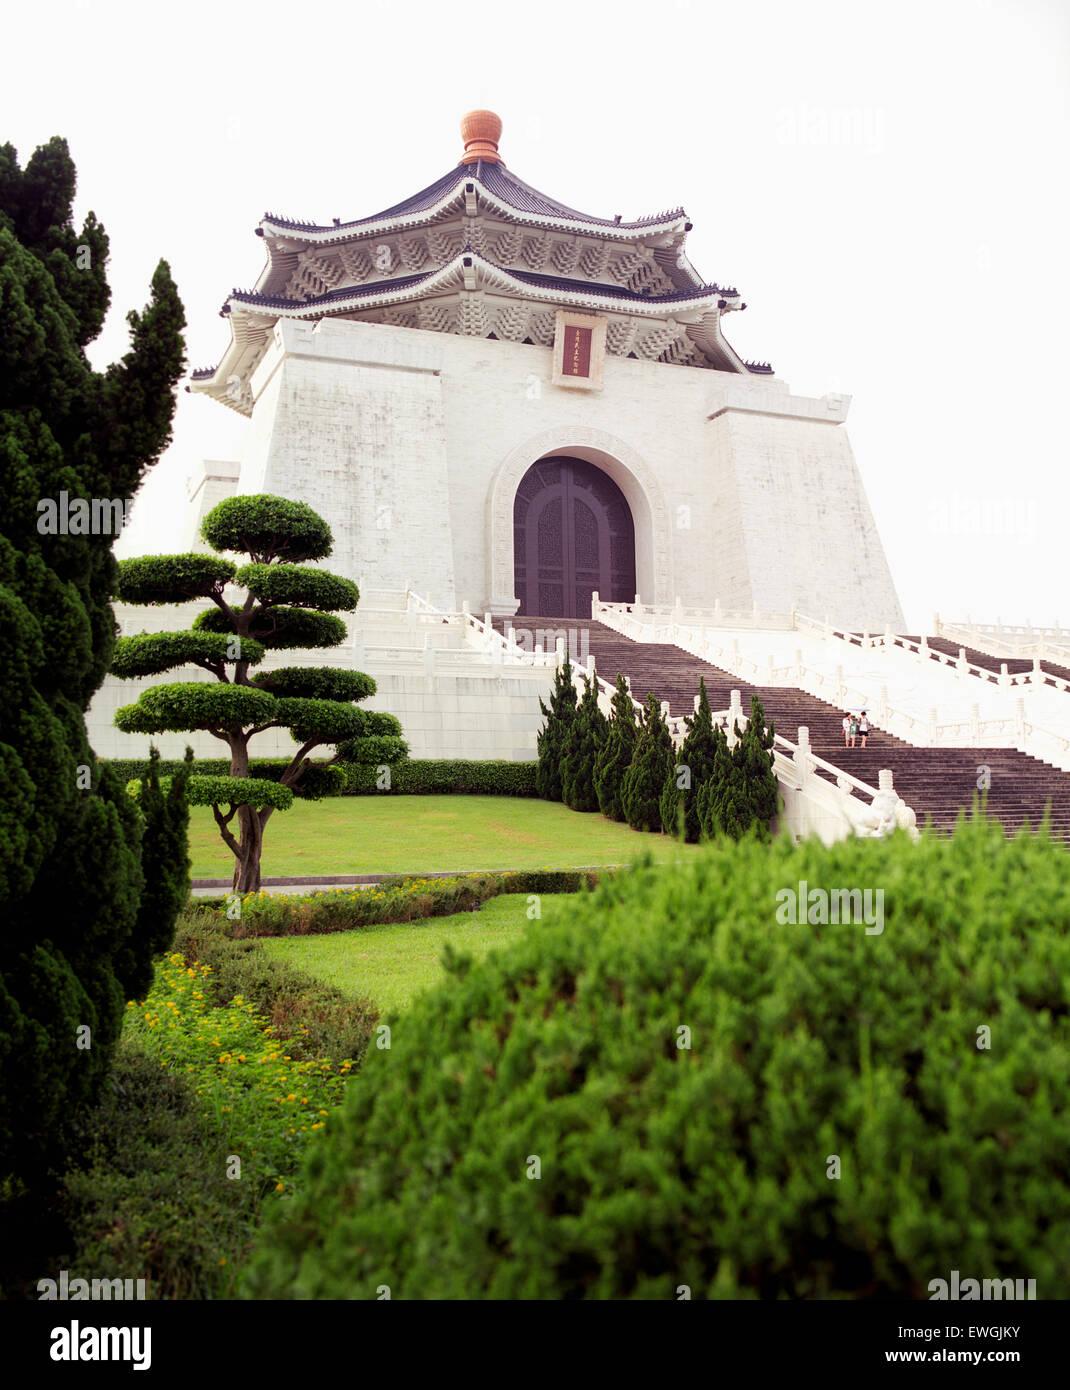 Chiang Kai-shek Memorial Hall al amanecer. Taipei, Taiwán. Asia. Imagen De Stock